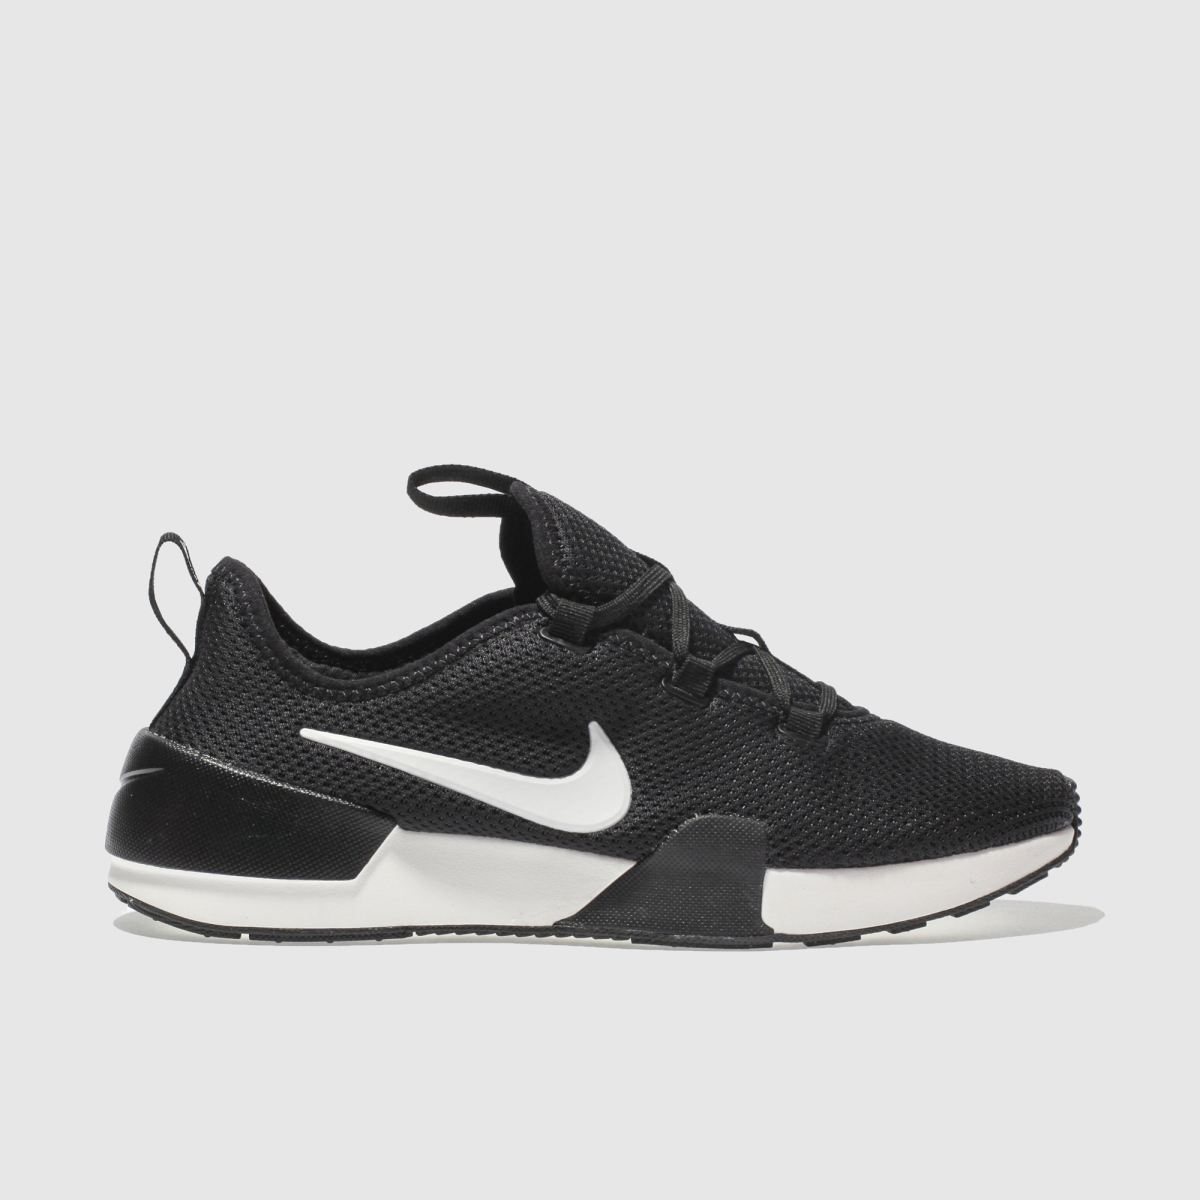 Nike Black & White Ashin Modern Trainers